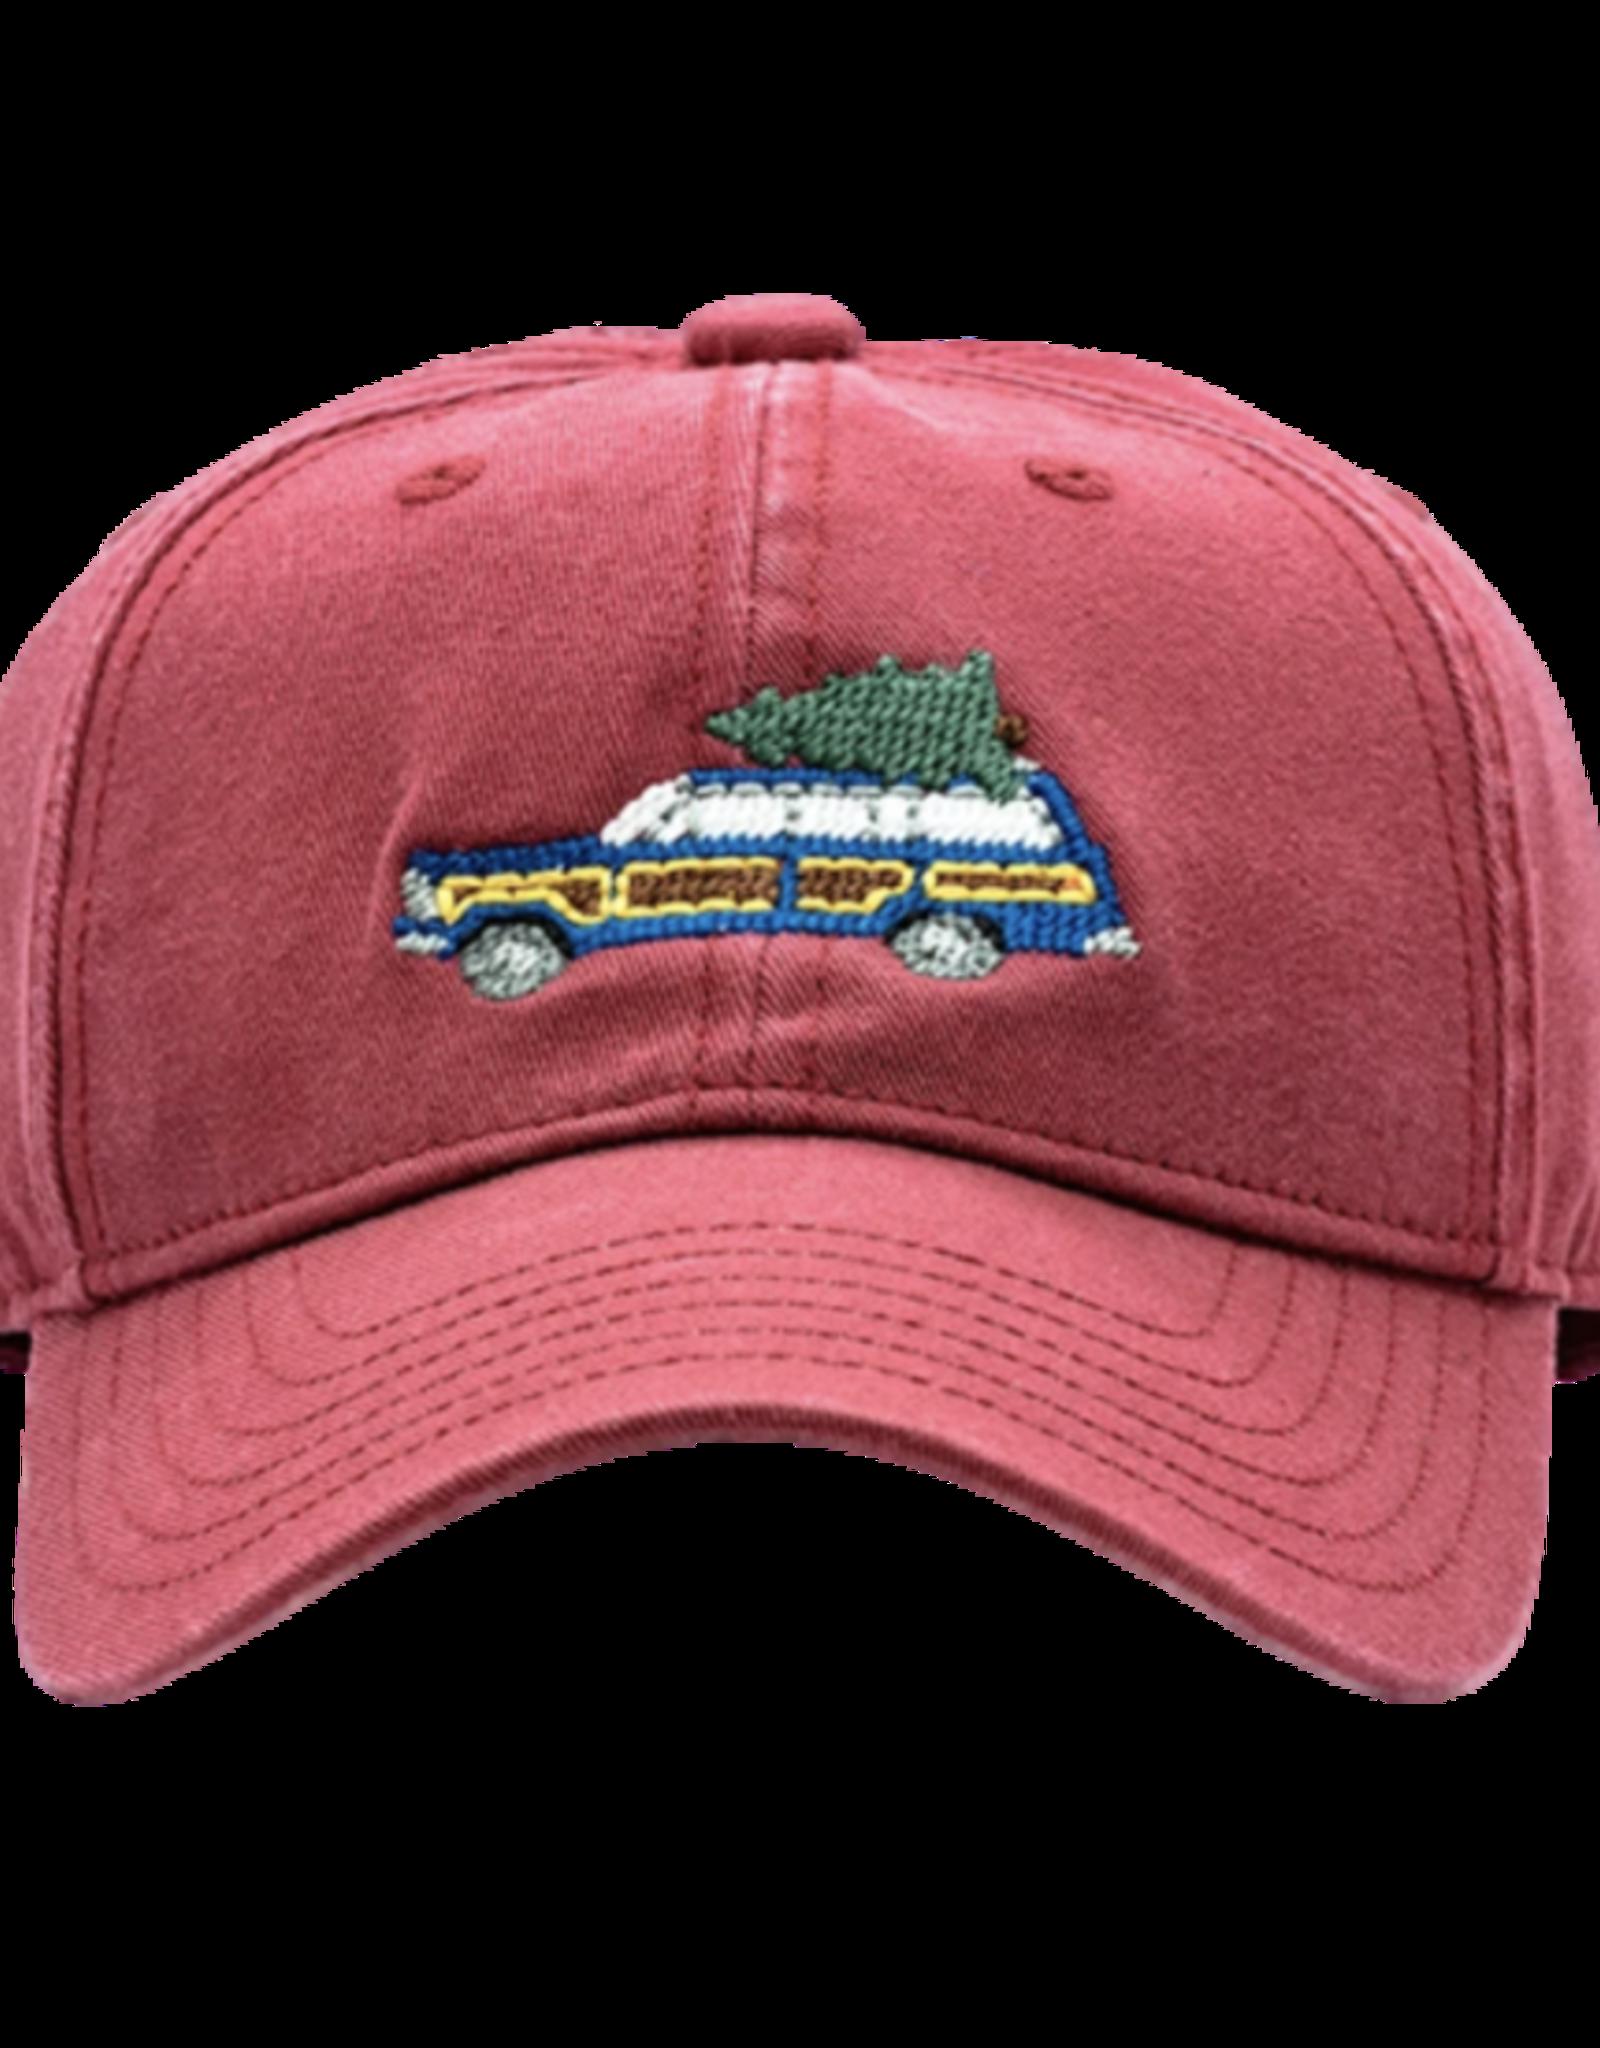 Harding Lane Holiday Wagonner Red Hat